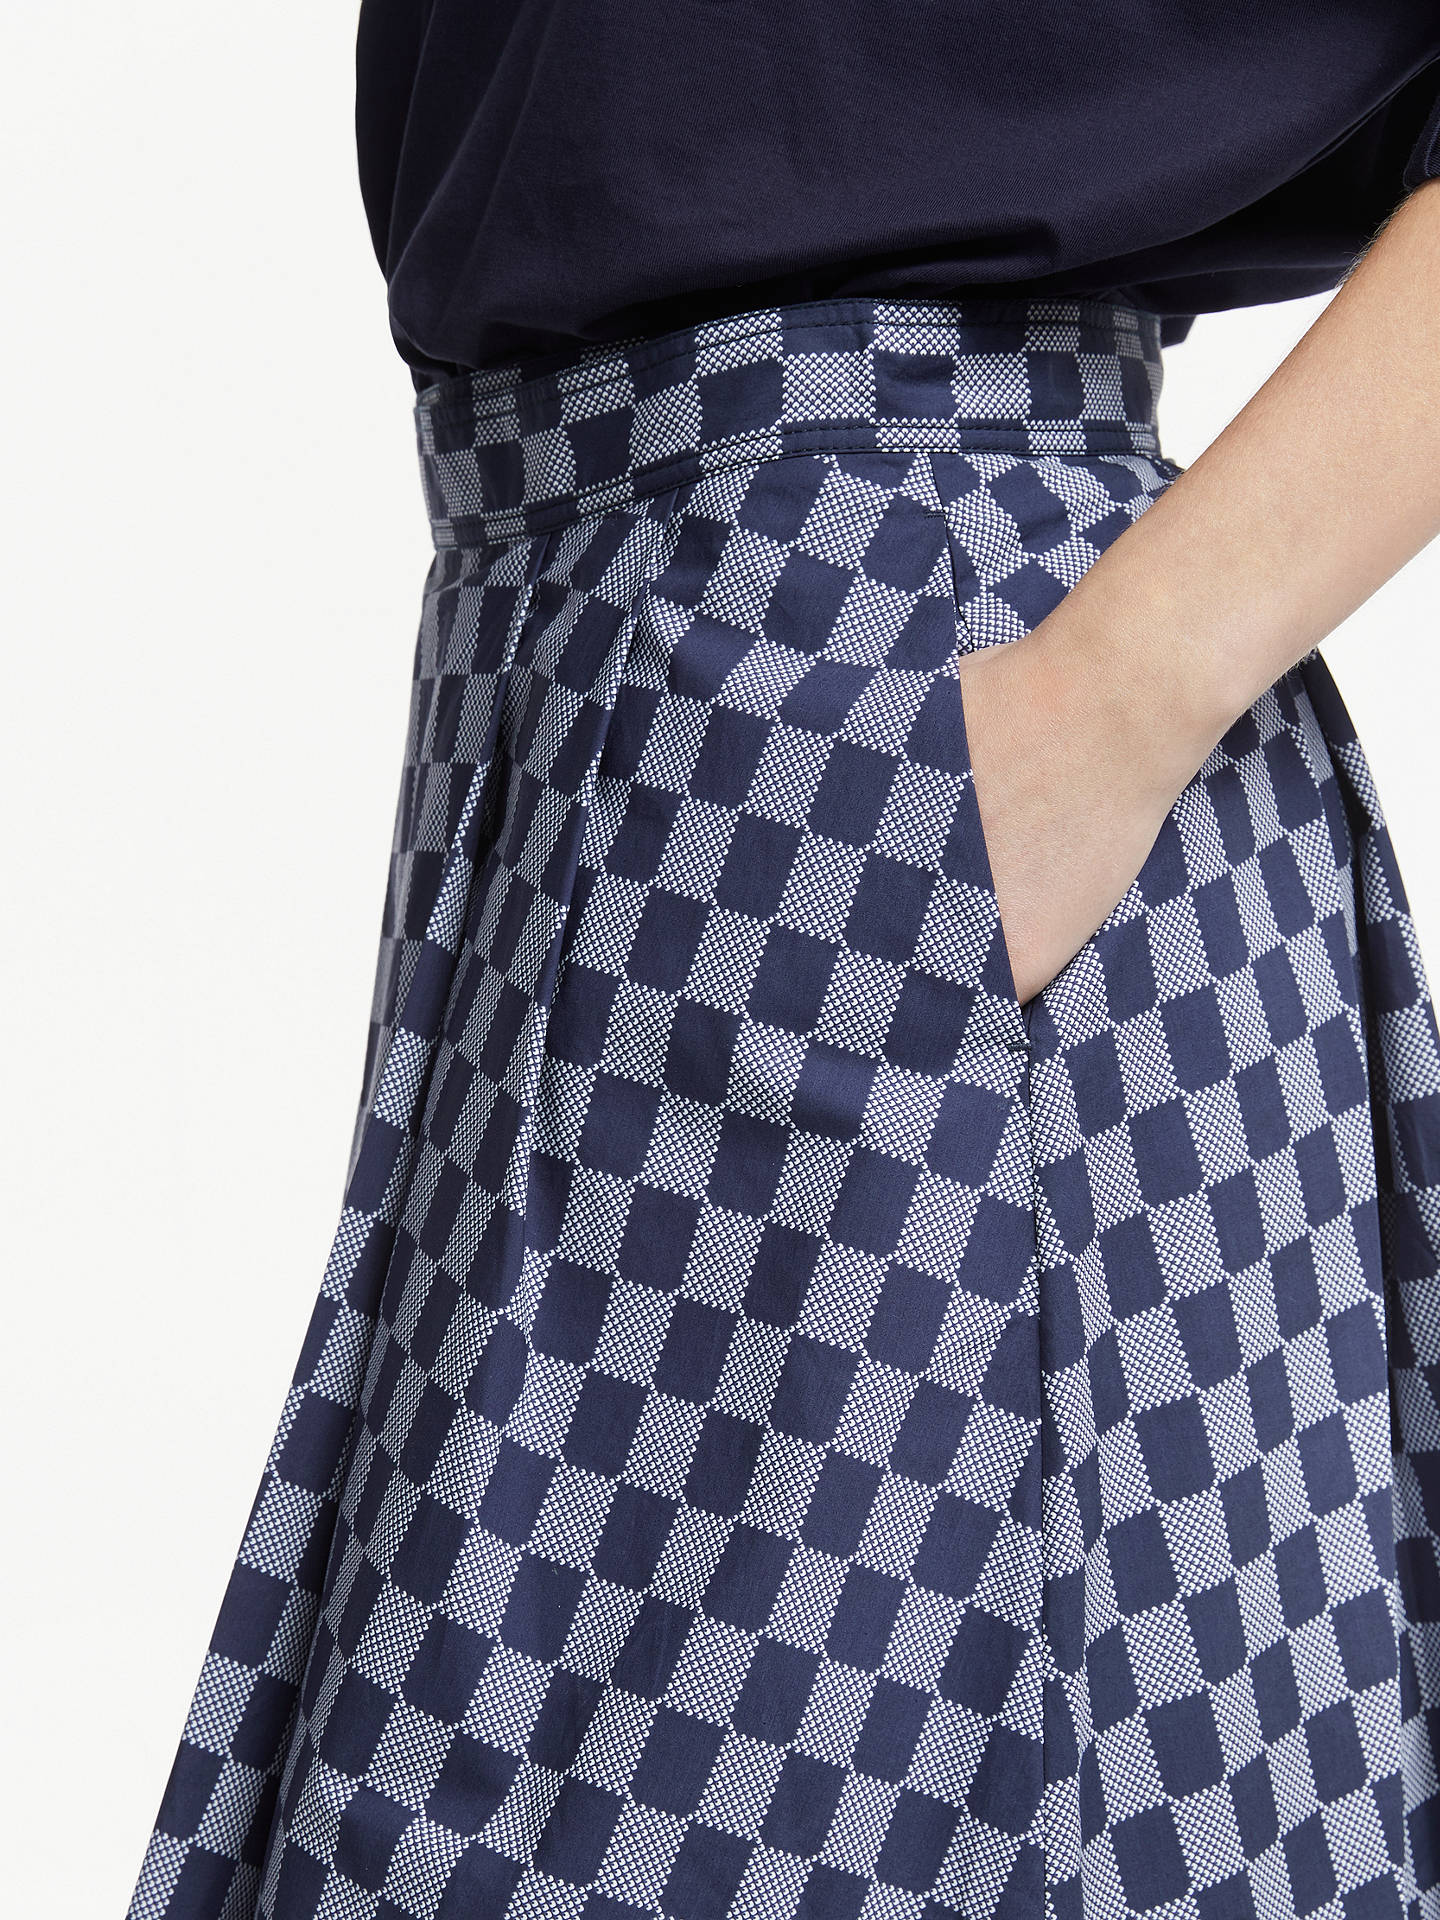 3d42267277 ... Buy Kin Seiji Printed Staggered Skirt, Blue, 8 Online at johnlewis.com  ...